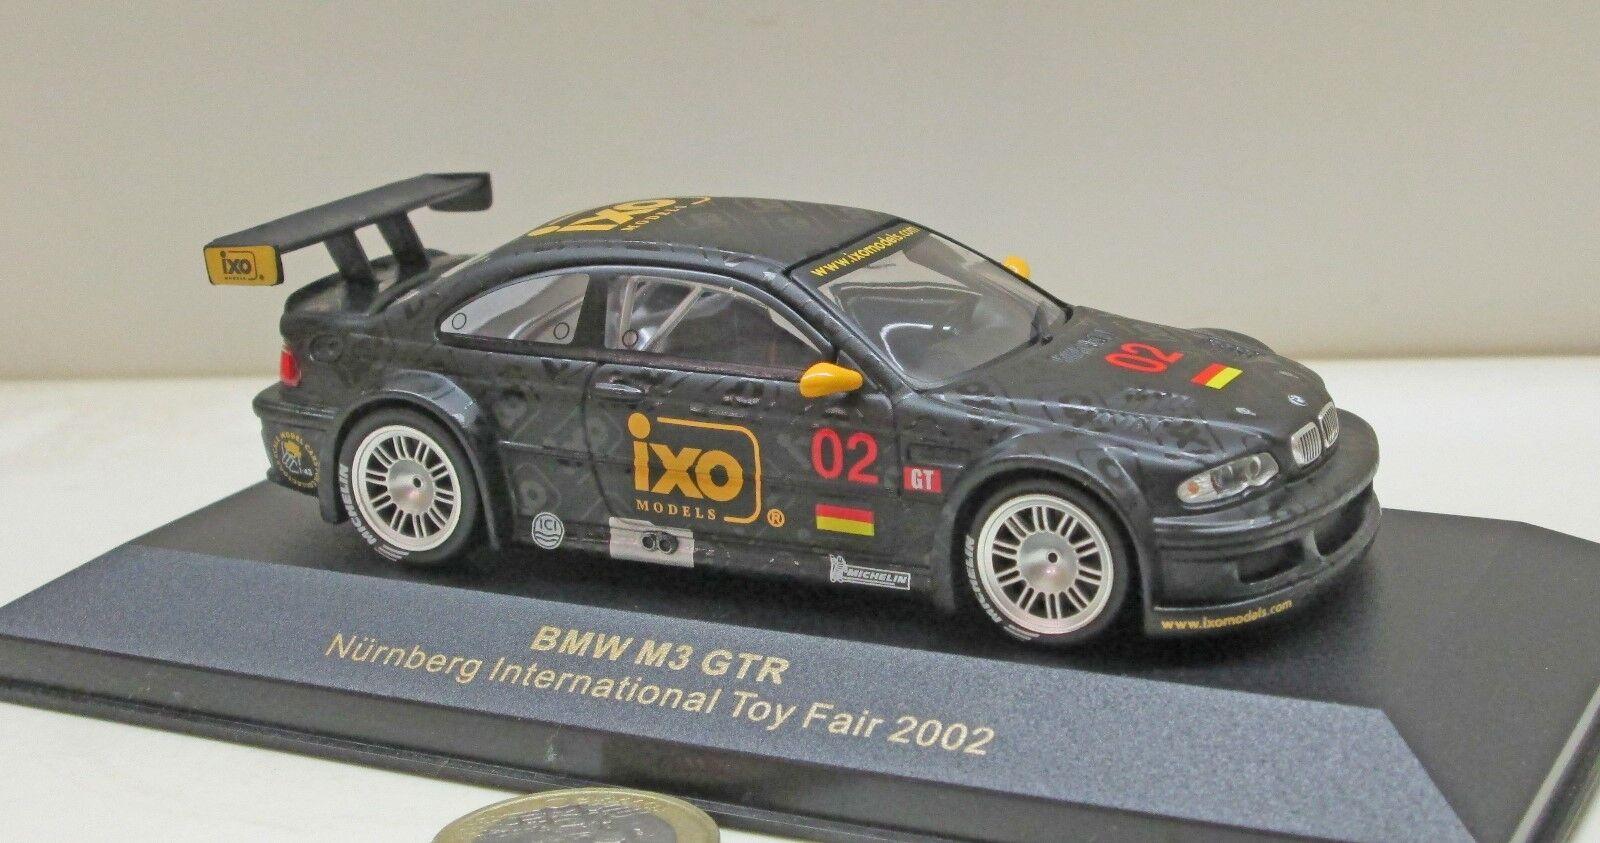 IXO Spécial Modèle; bmw m3 gtr, jouets messe 2002 (427)